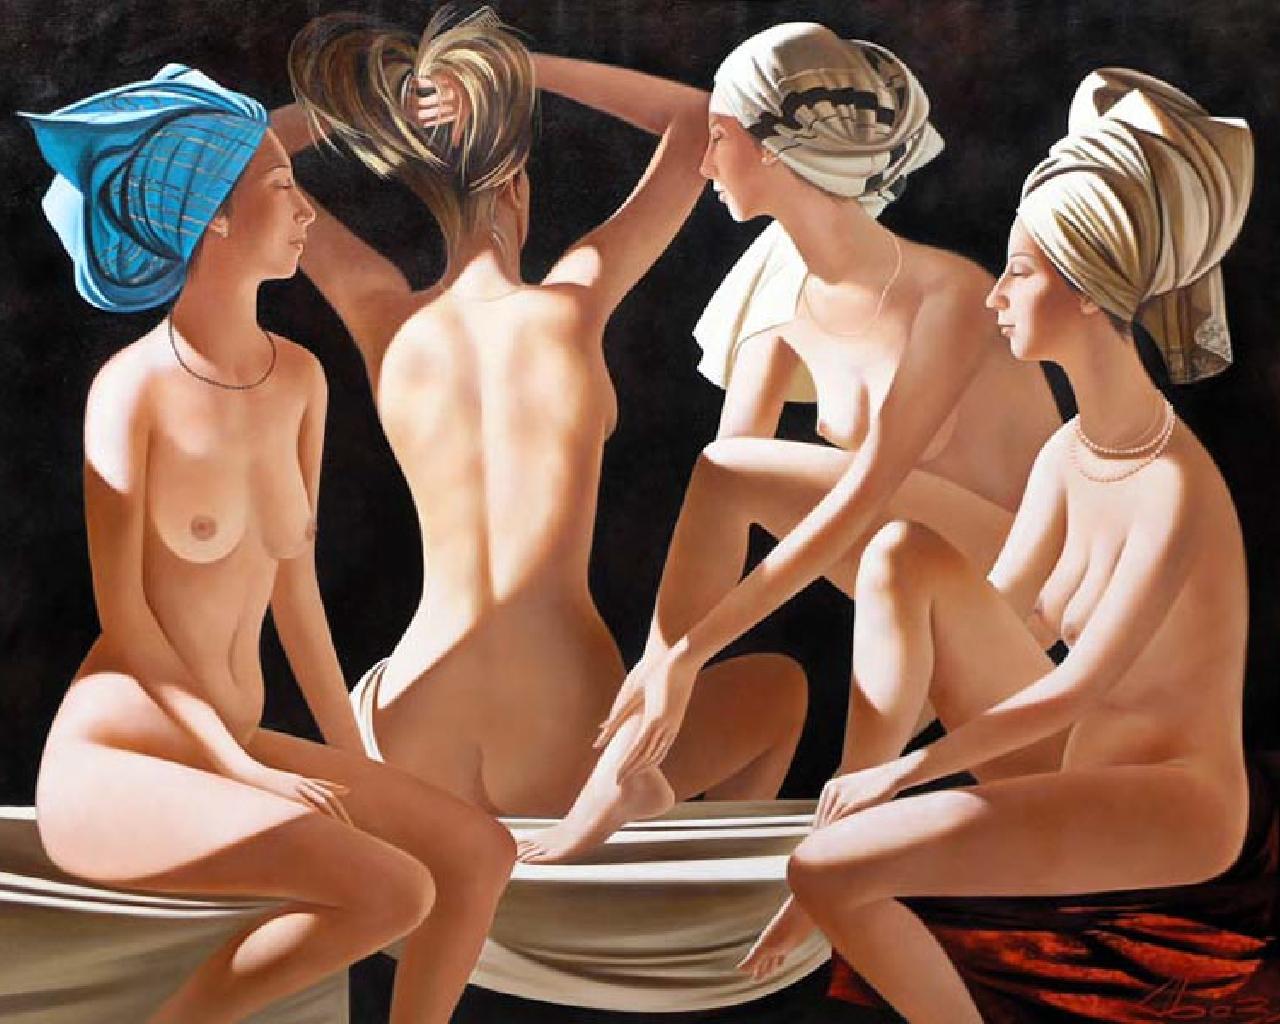 женщина с тремя грудями фото